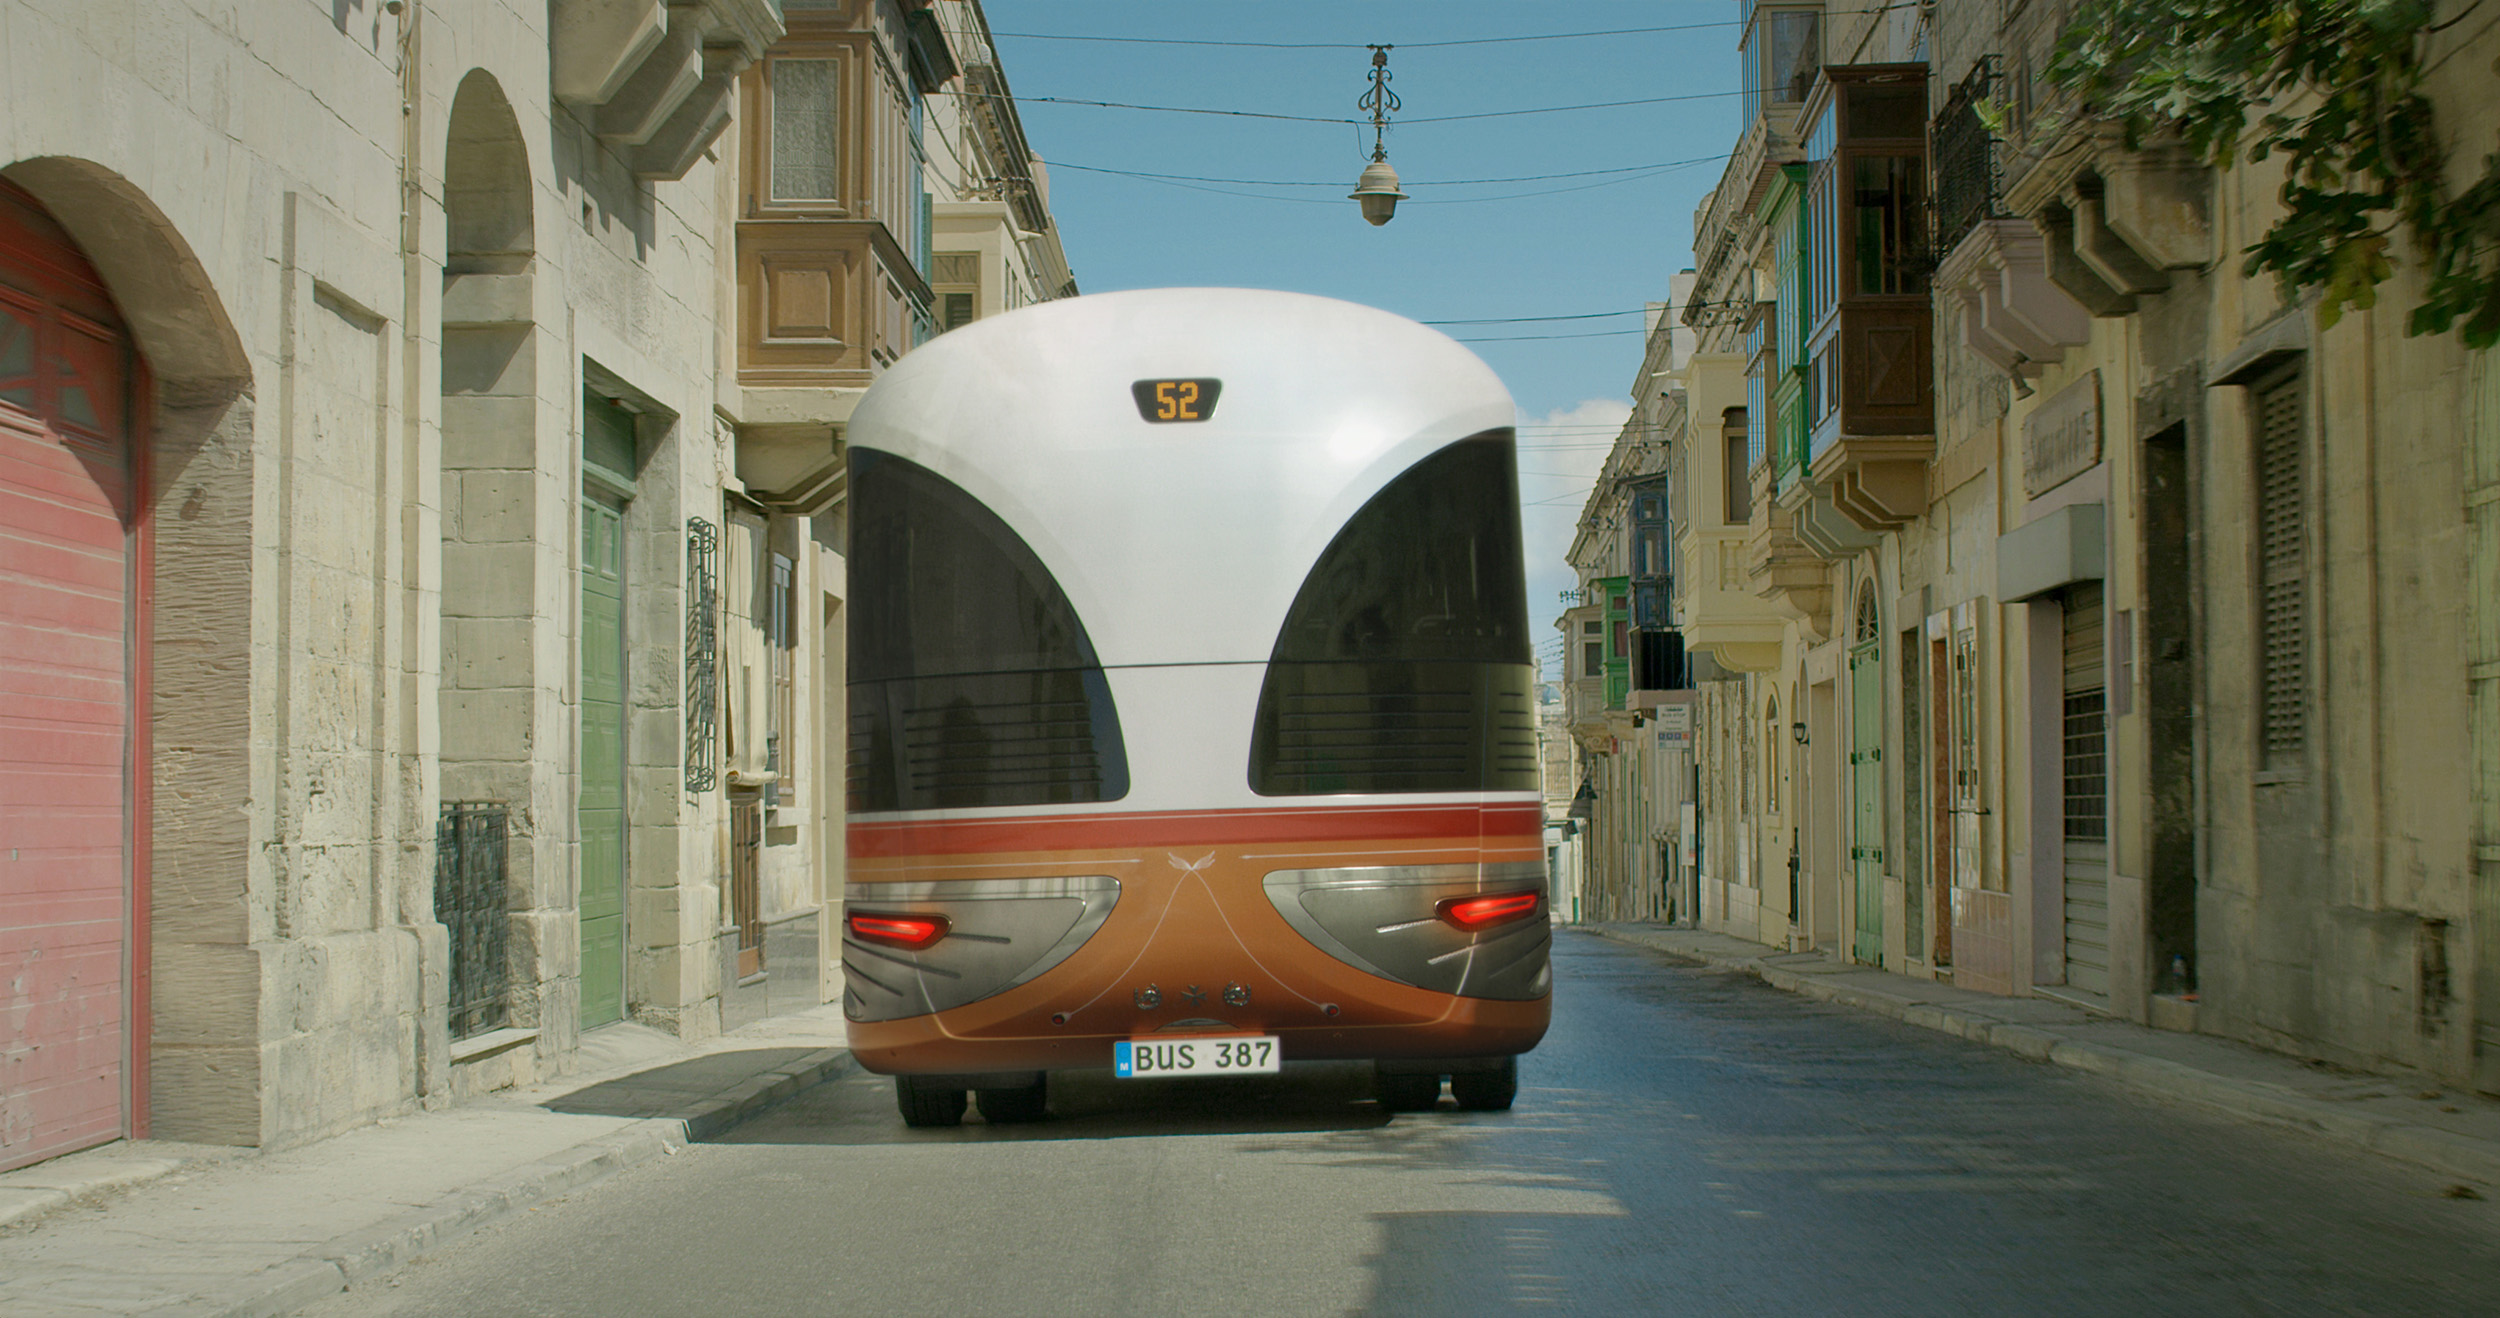 Visualisation_04_Mizzi Studio_Malta Bus Reborn_web.jpg